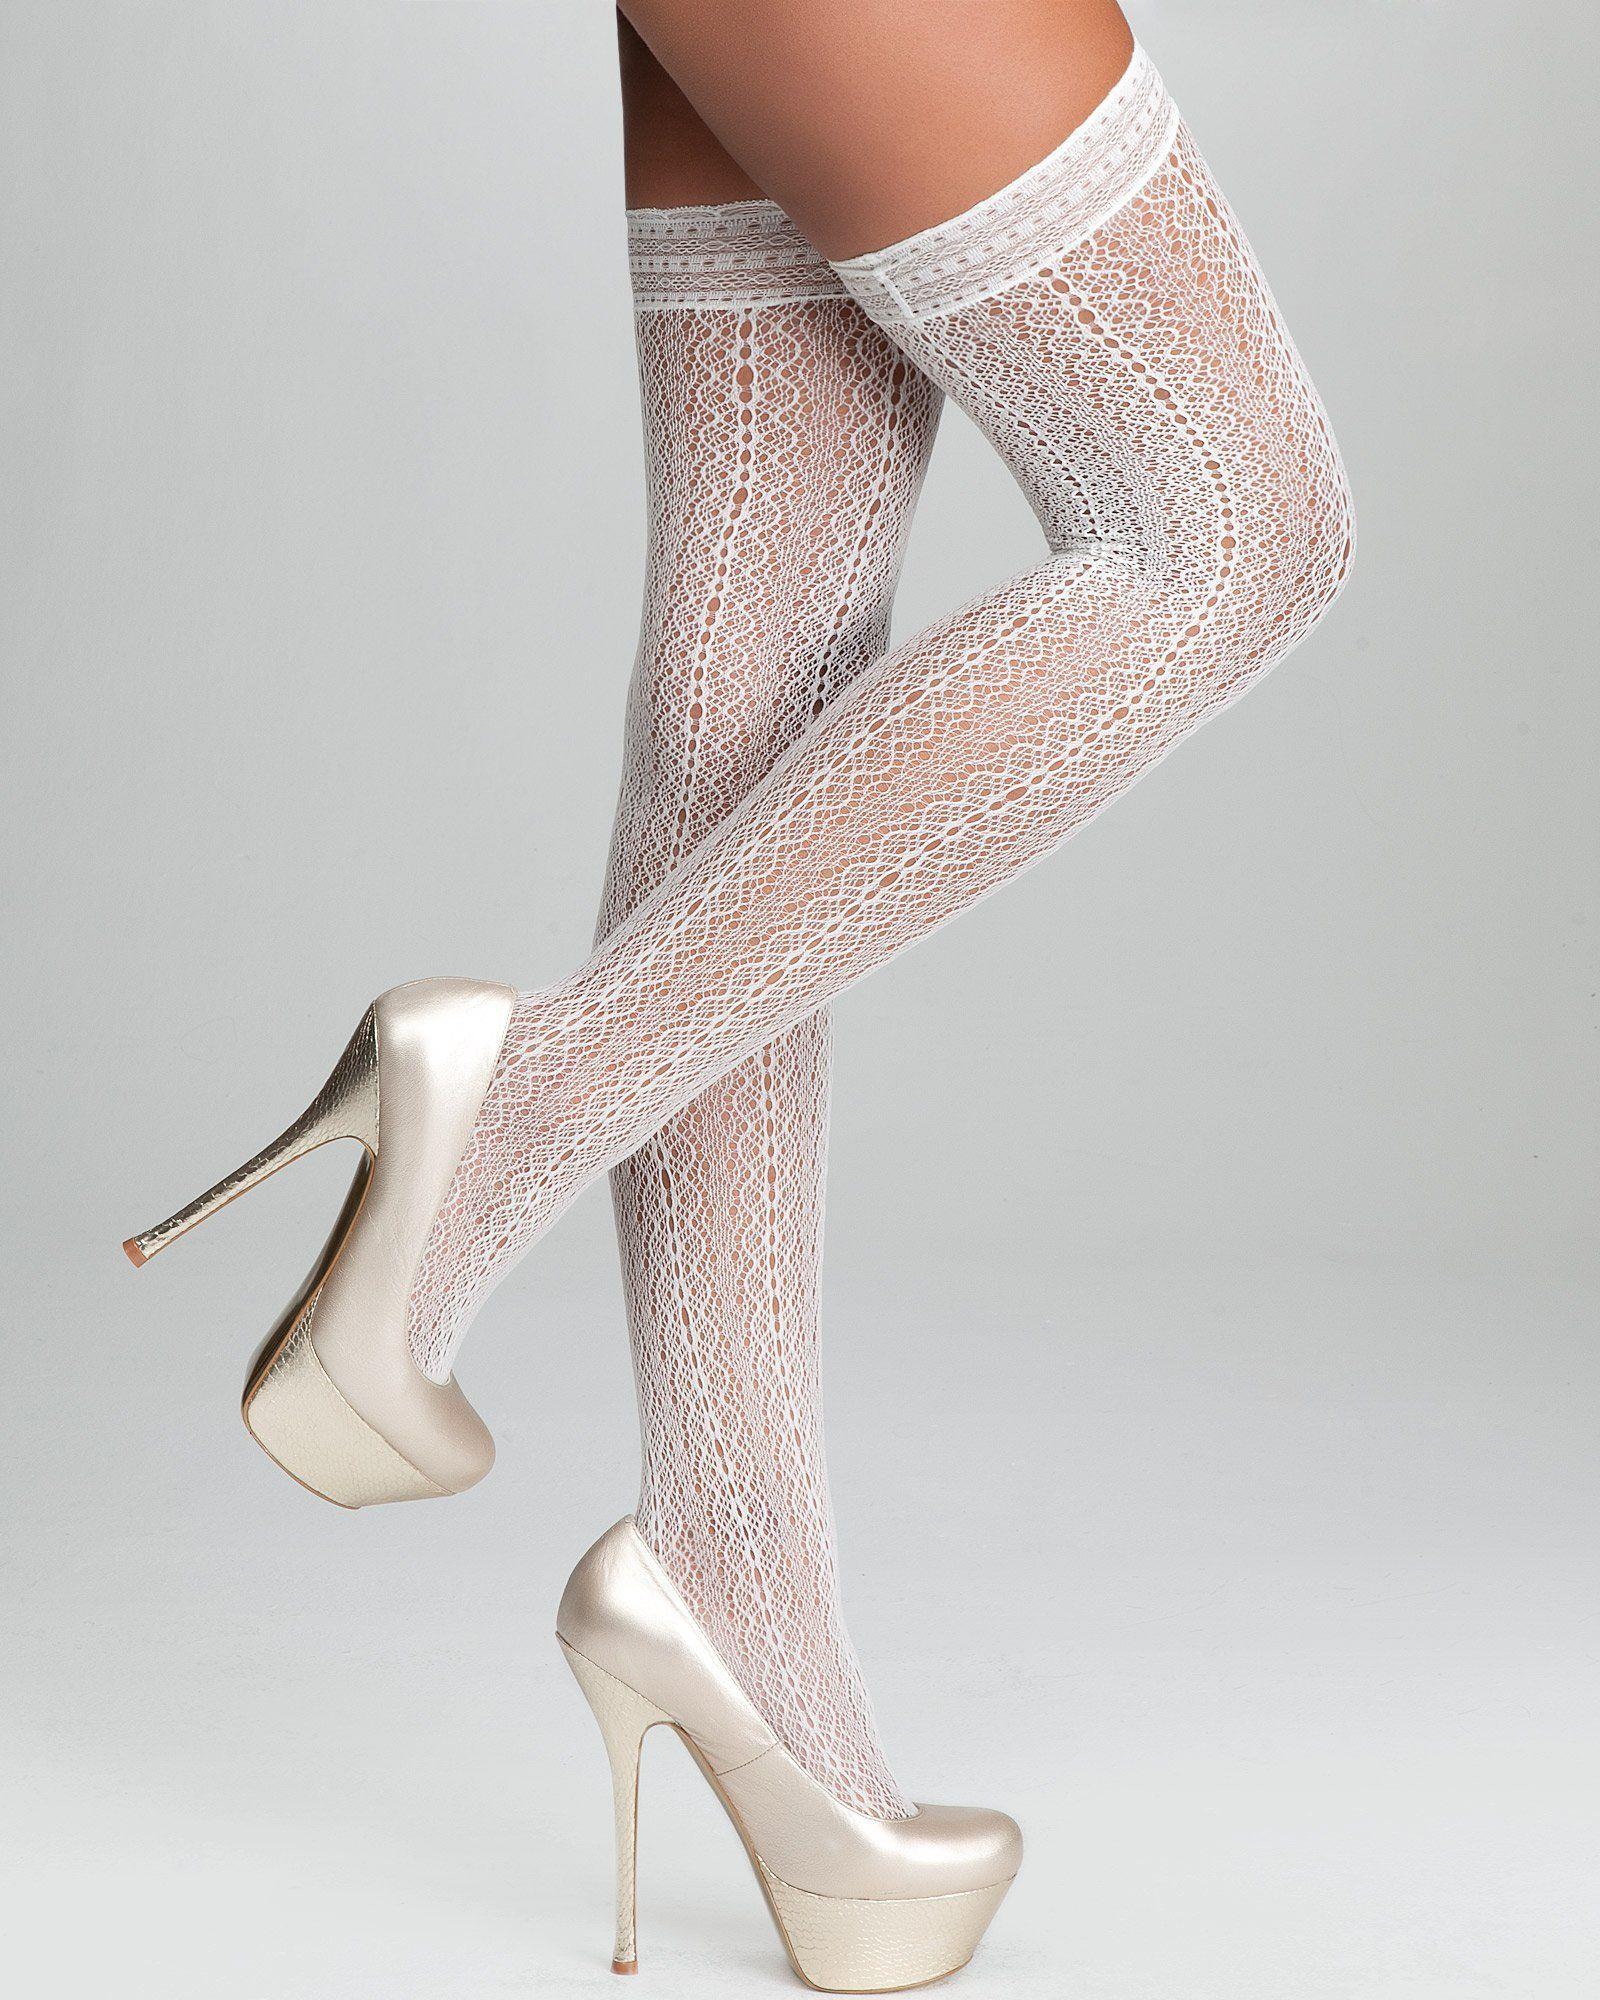 Black High Heels Stocking